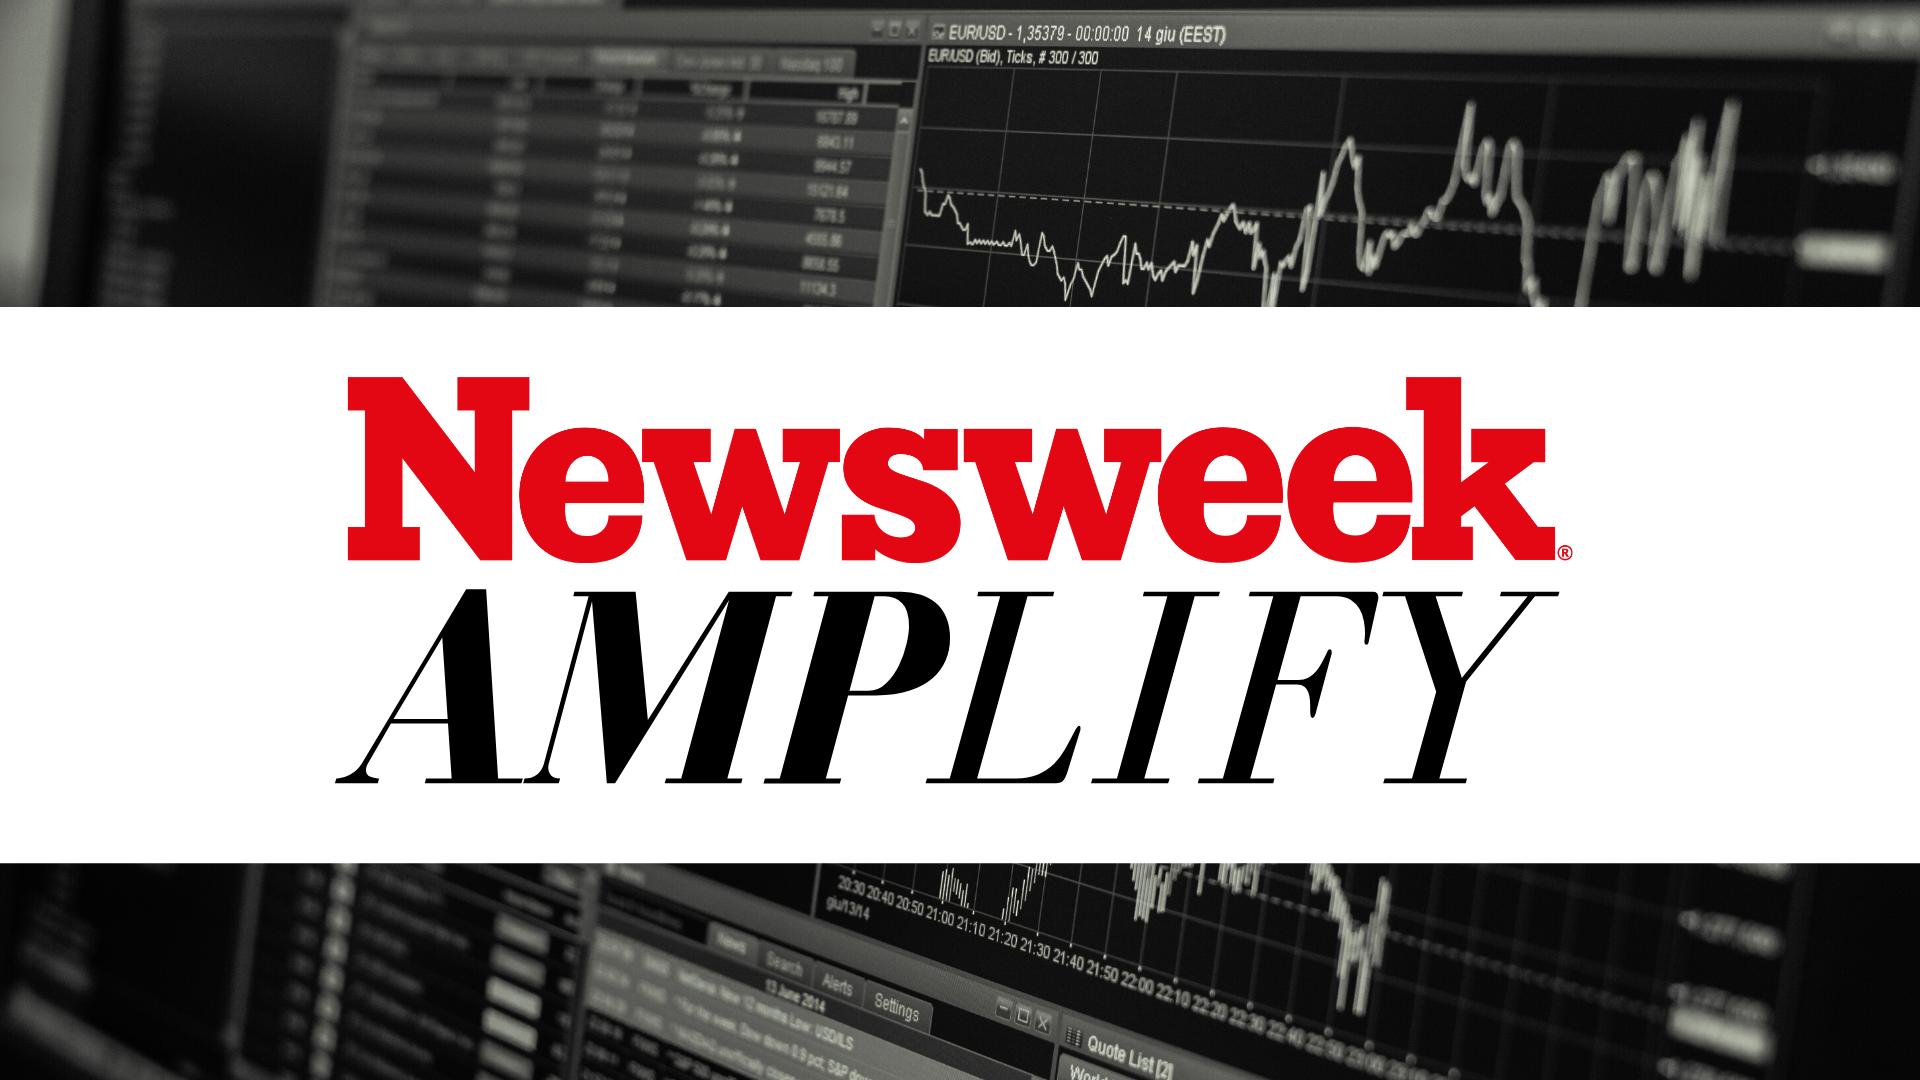 Newsweek AMPLIFY